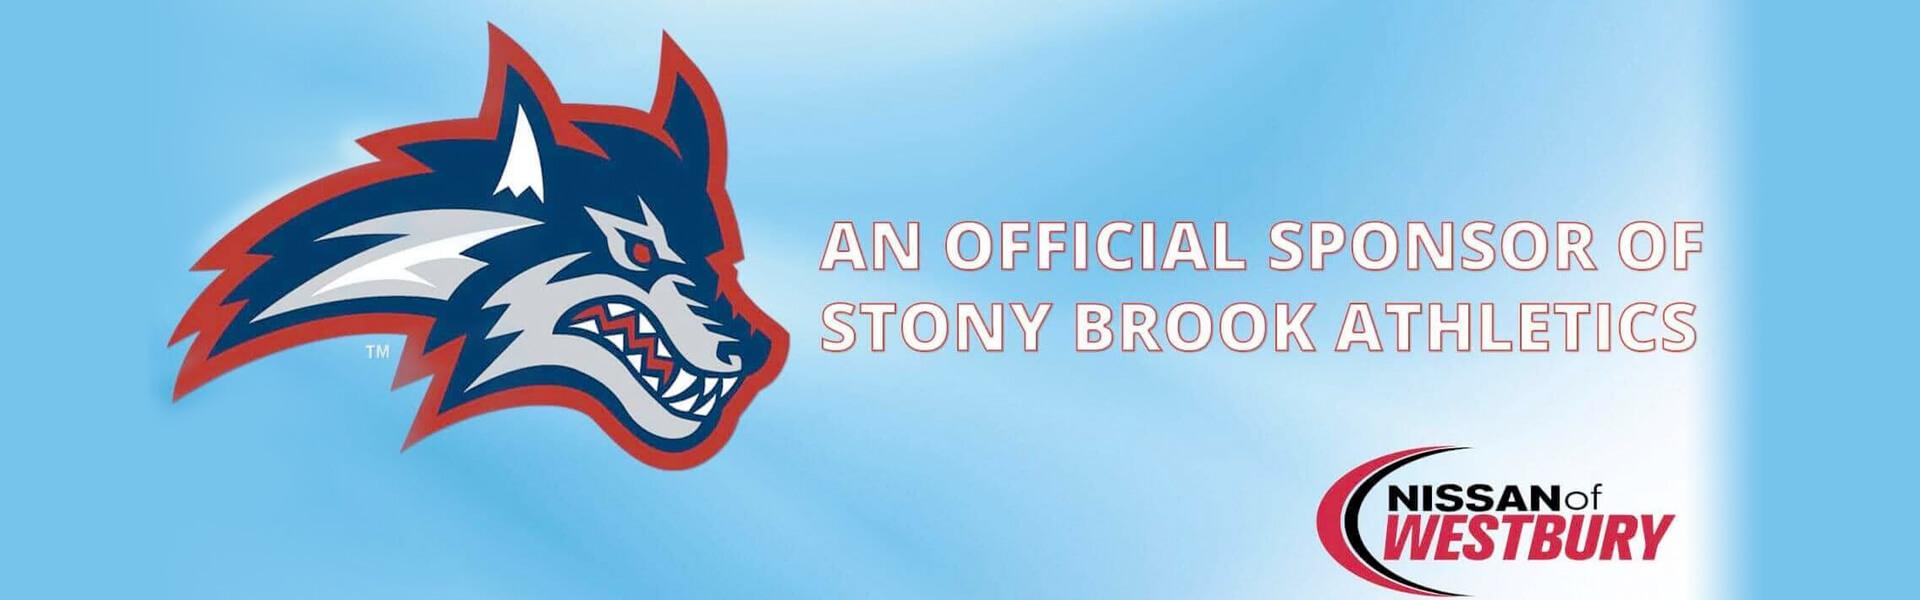 Wonderful Stony Brook Athletics